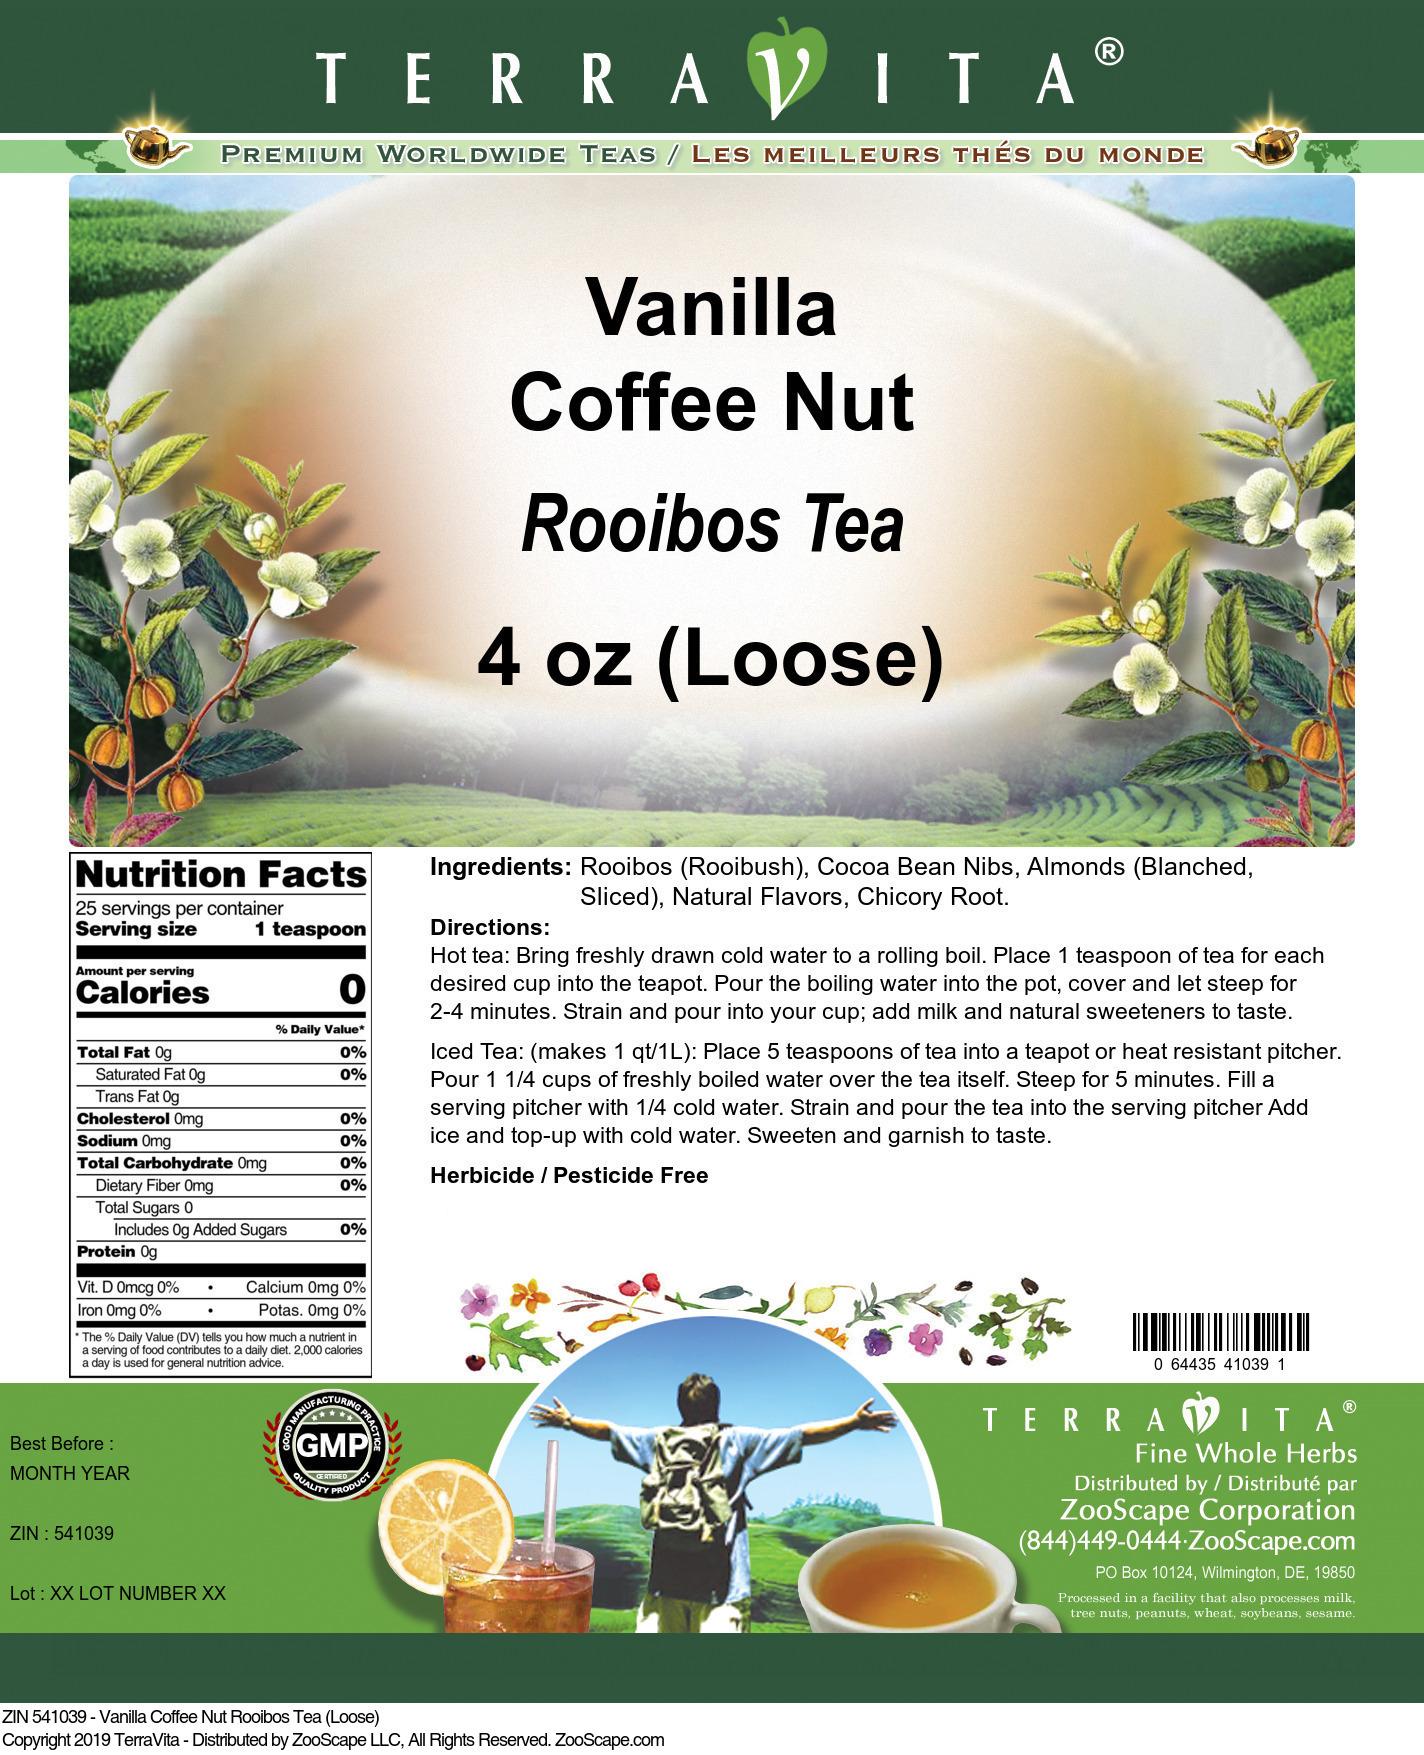 Vanilla Coffee Nut Rooibos Tea